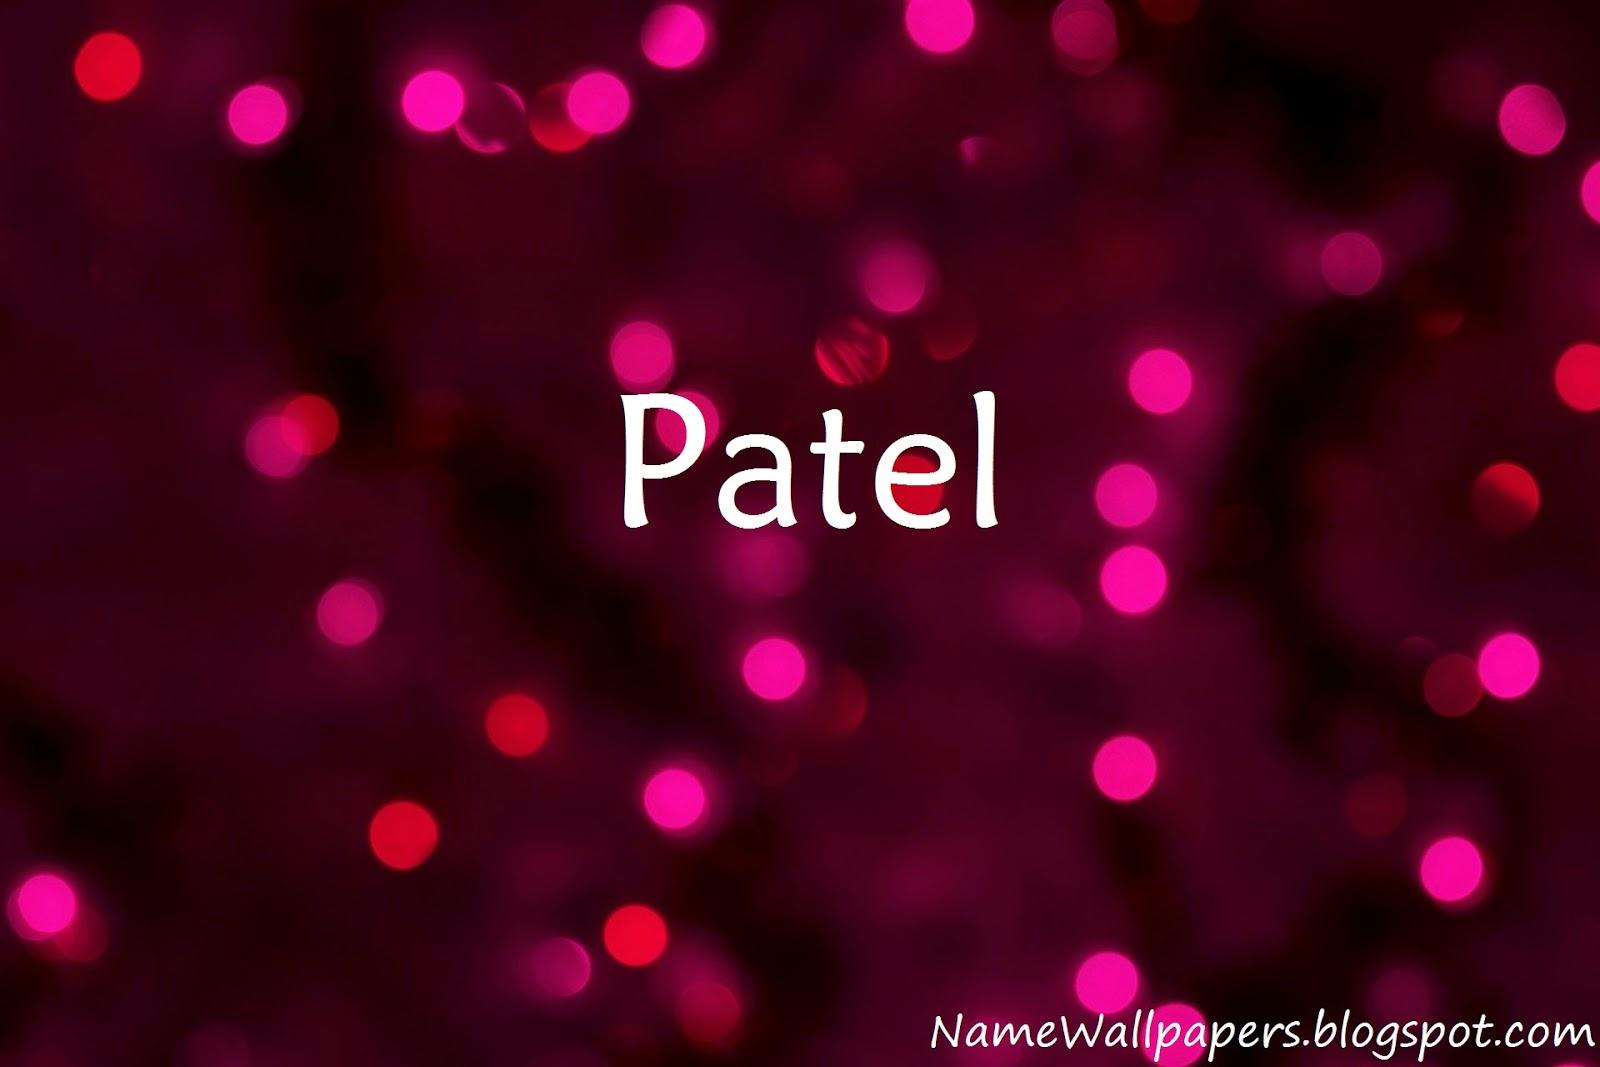 Download Patel Name Wallpaper Gallery